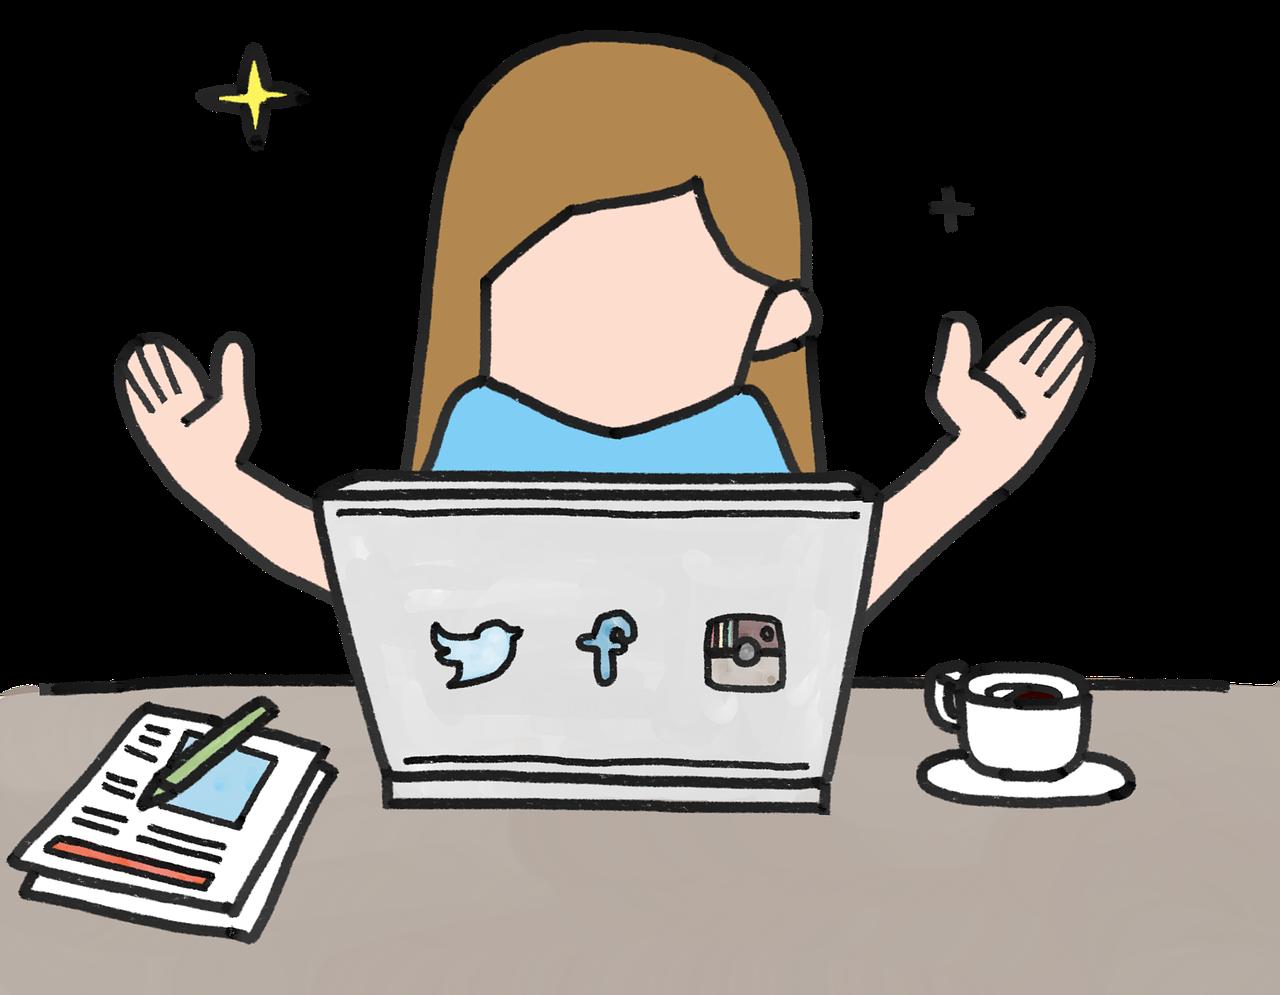 SNSマーケティングとは?活用できるソーシャルメディアの特徴や手法について